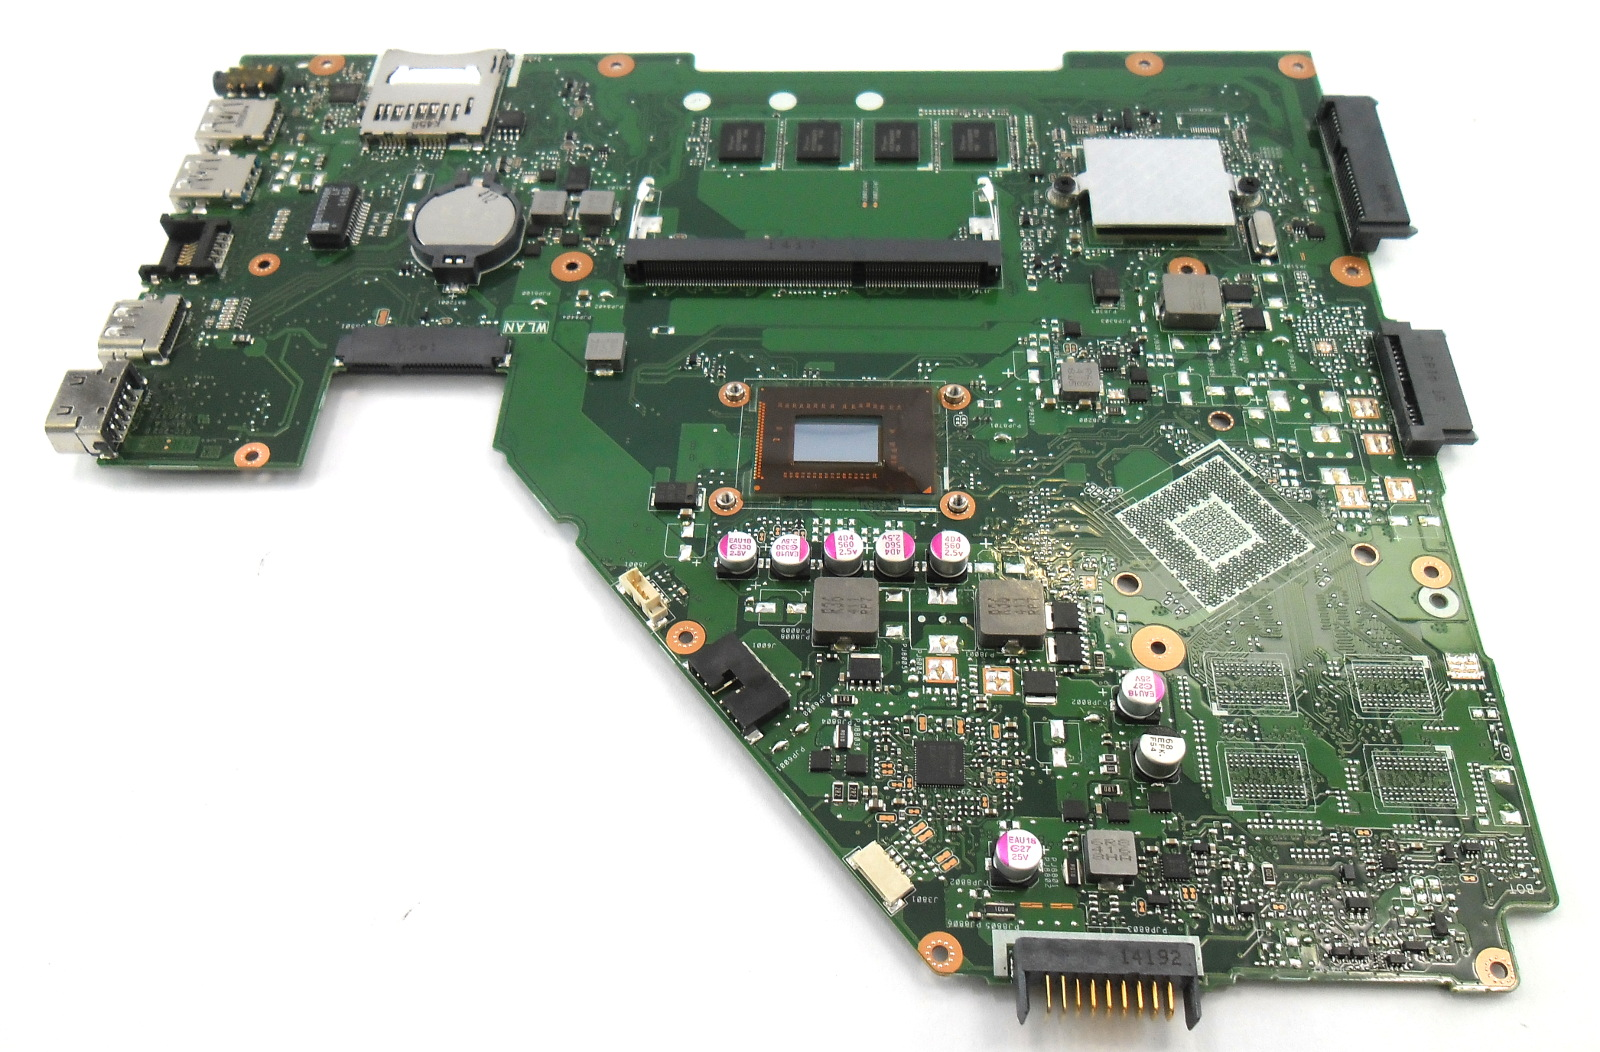 60NB00U0-MBH010 Asus X550CA Motherboard with Intel SR0N9 1.8GHz i3-3217U CPU